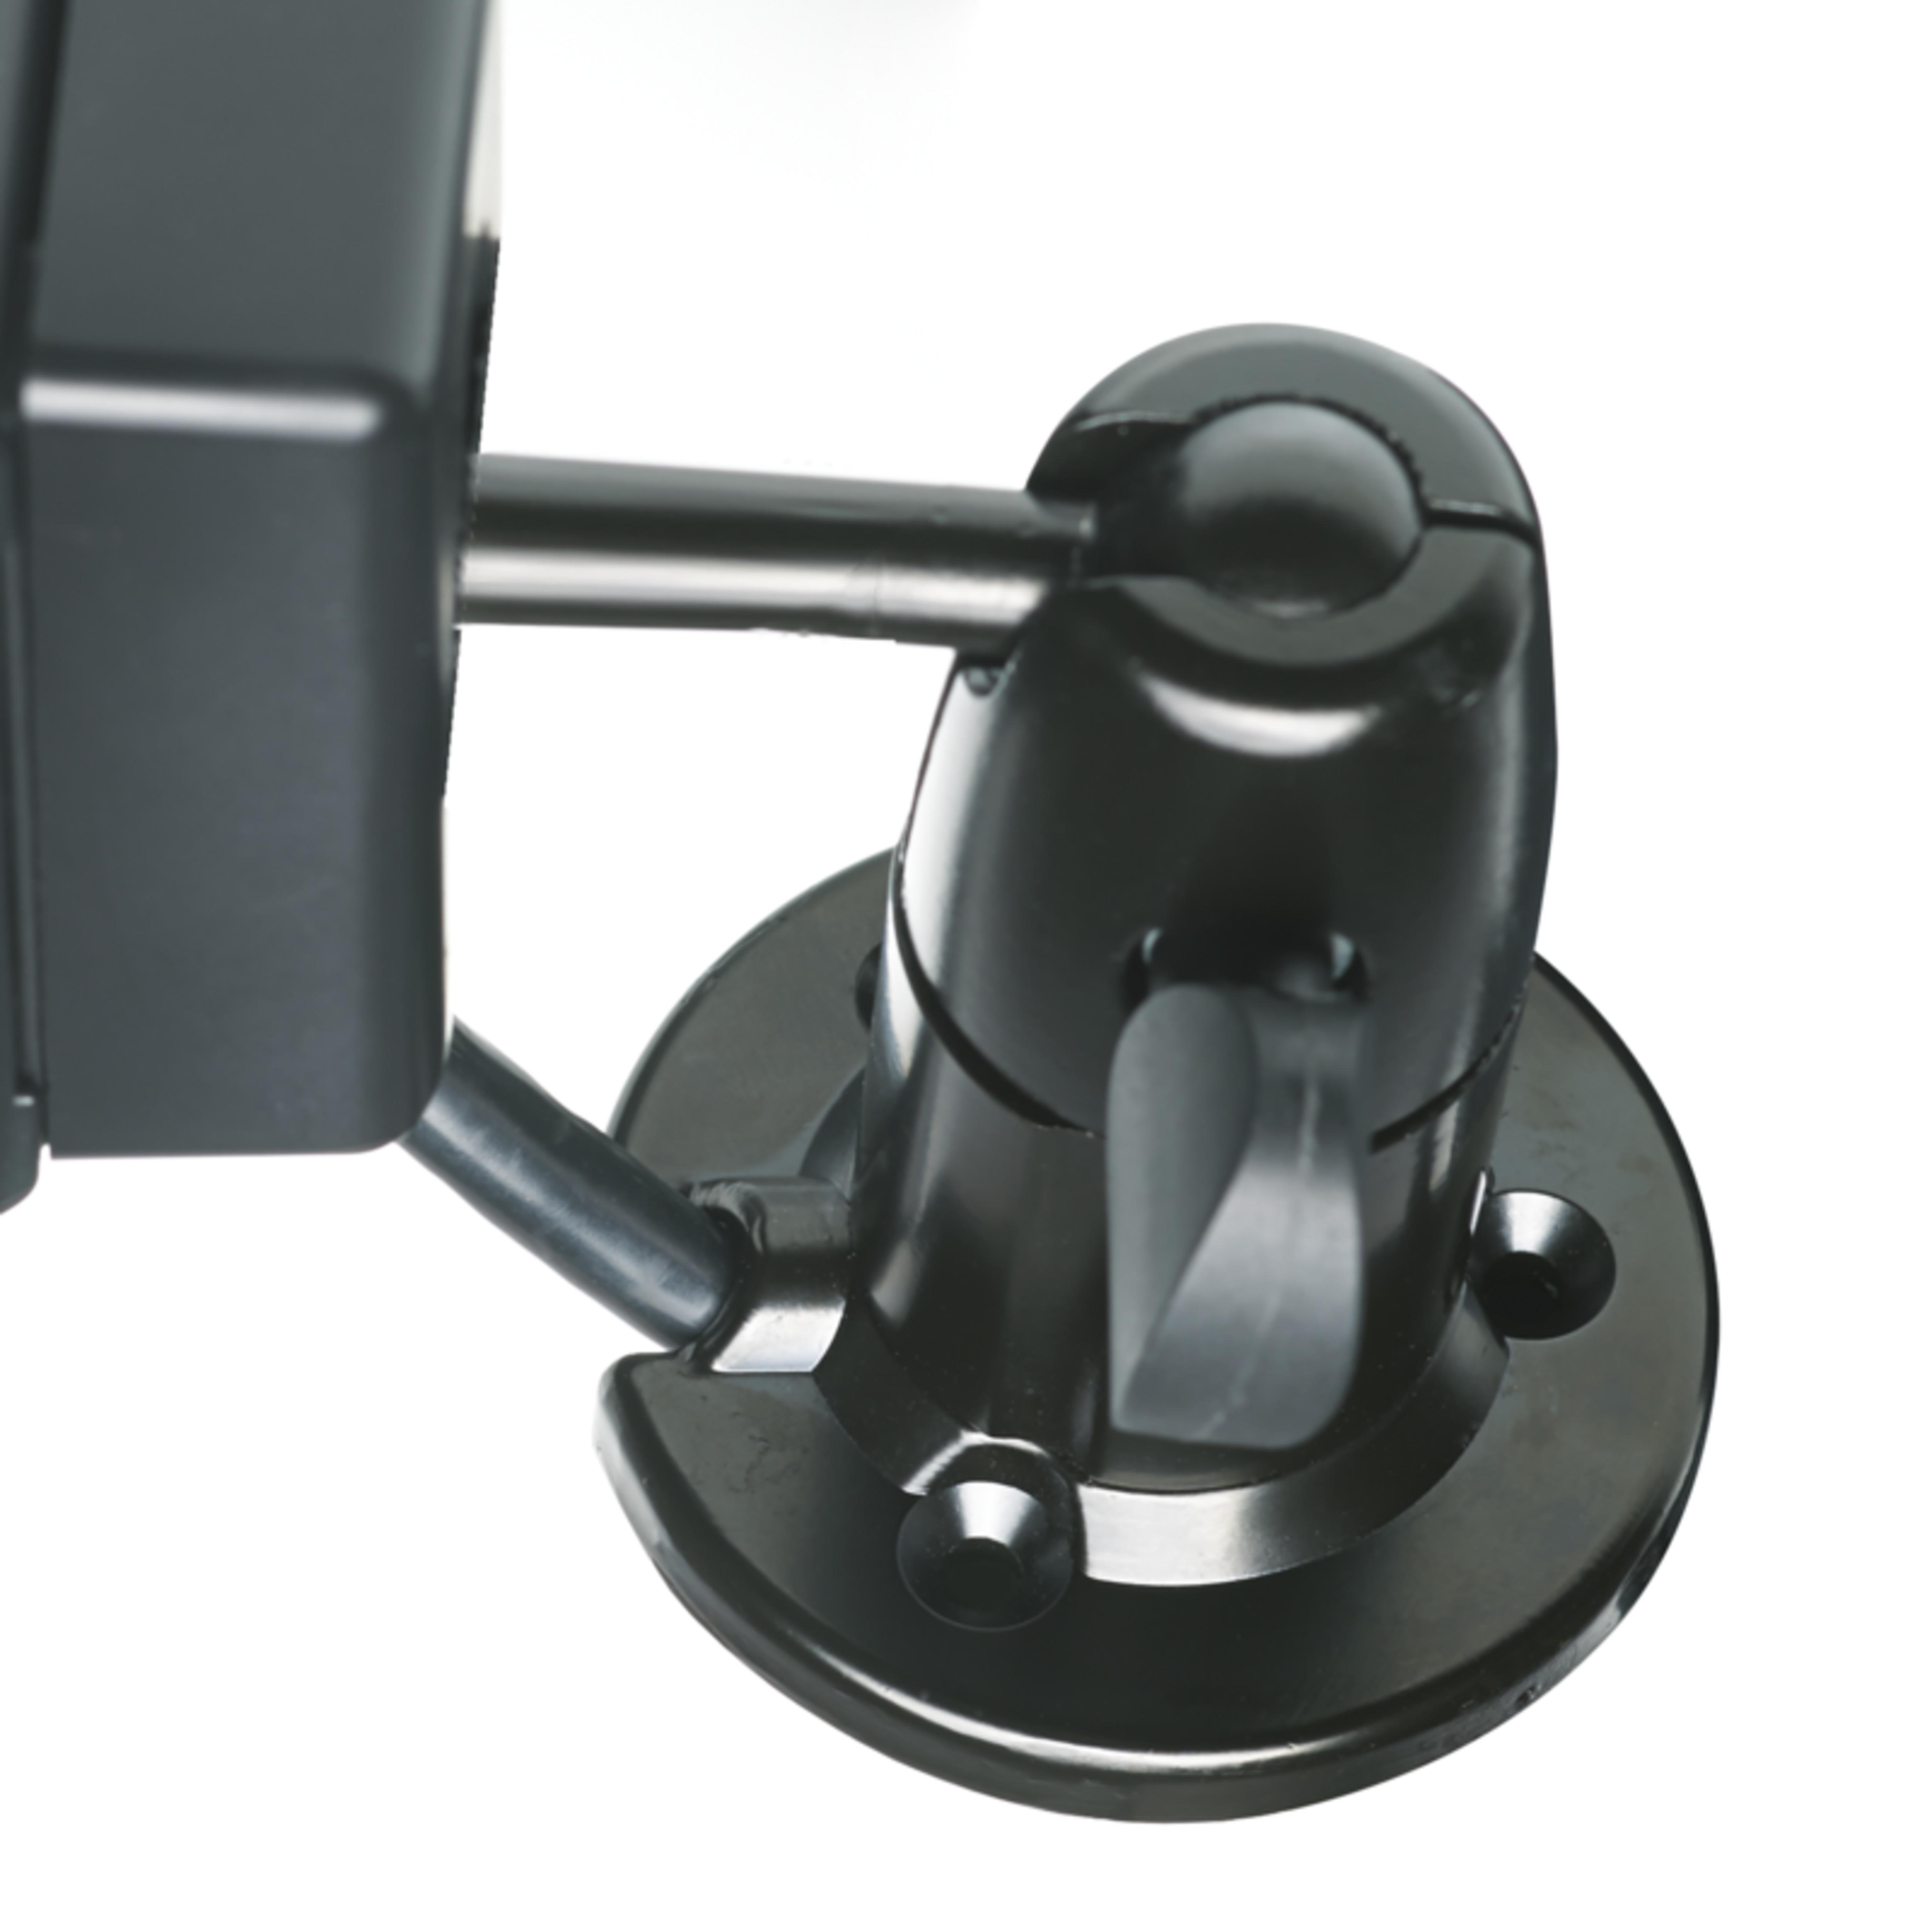 Ryggekamera DOMETIC PerfectView RVS 594 5 skjerm lukkbart twin kamera sølv 9600008363